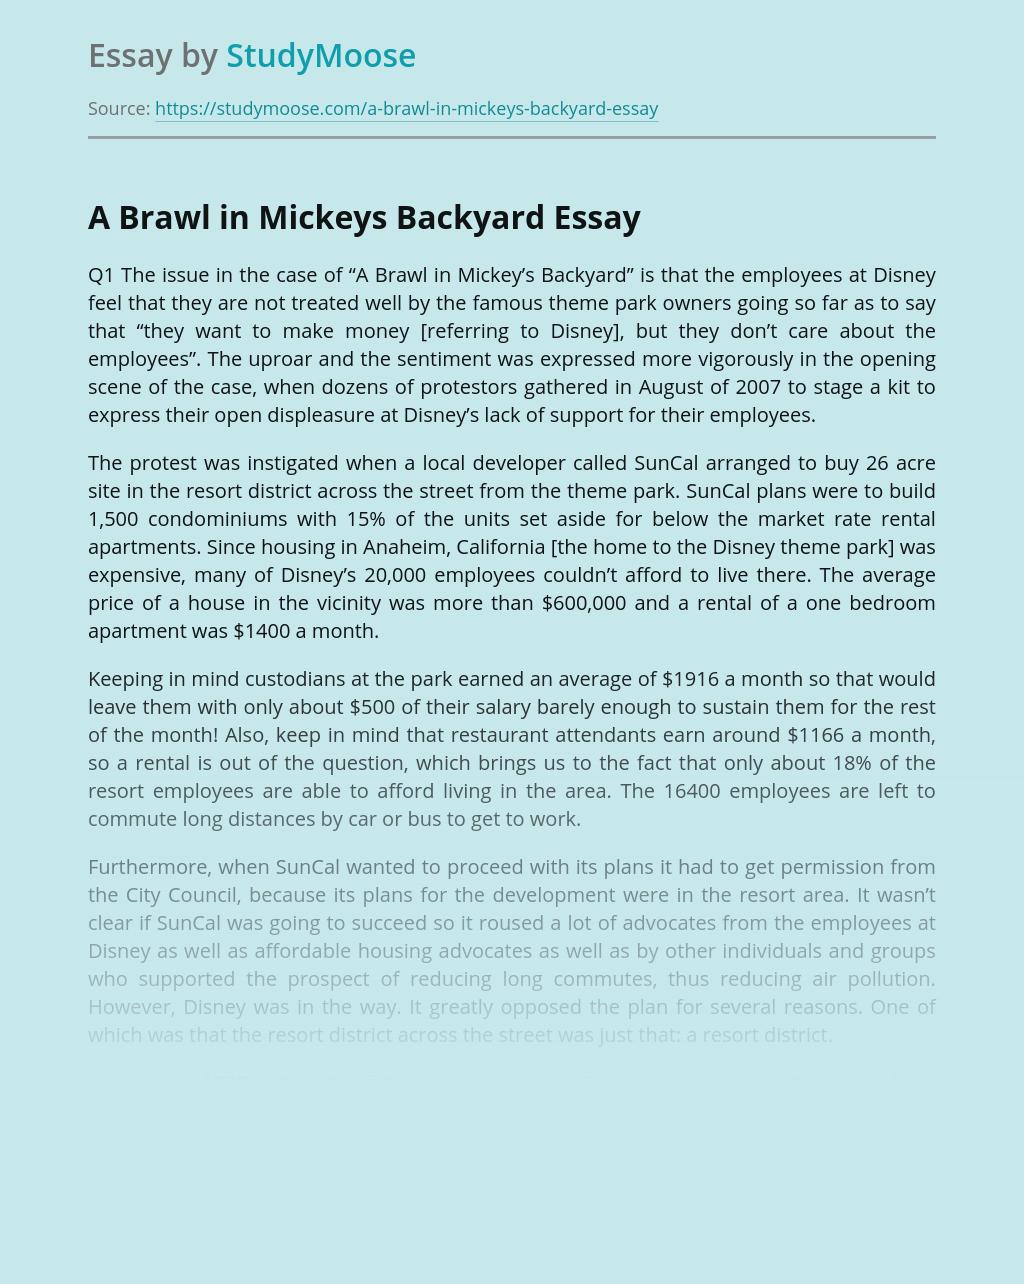 A Brawl in Mickeys Backyard